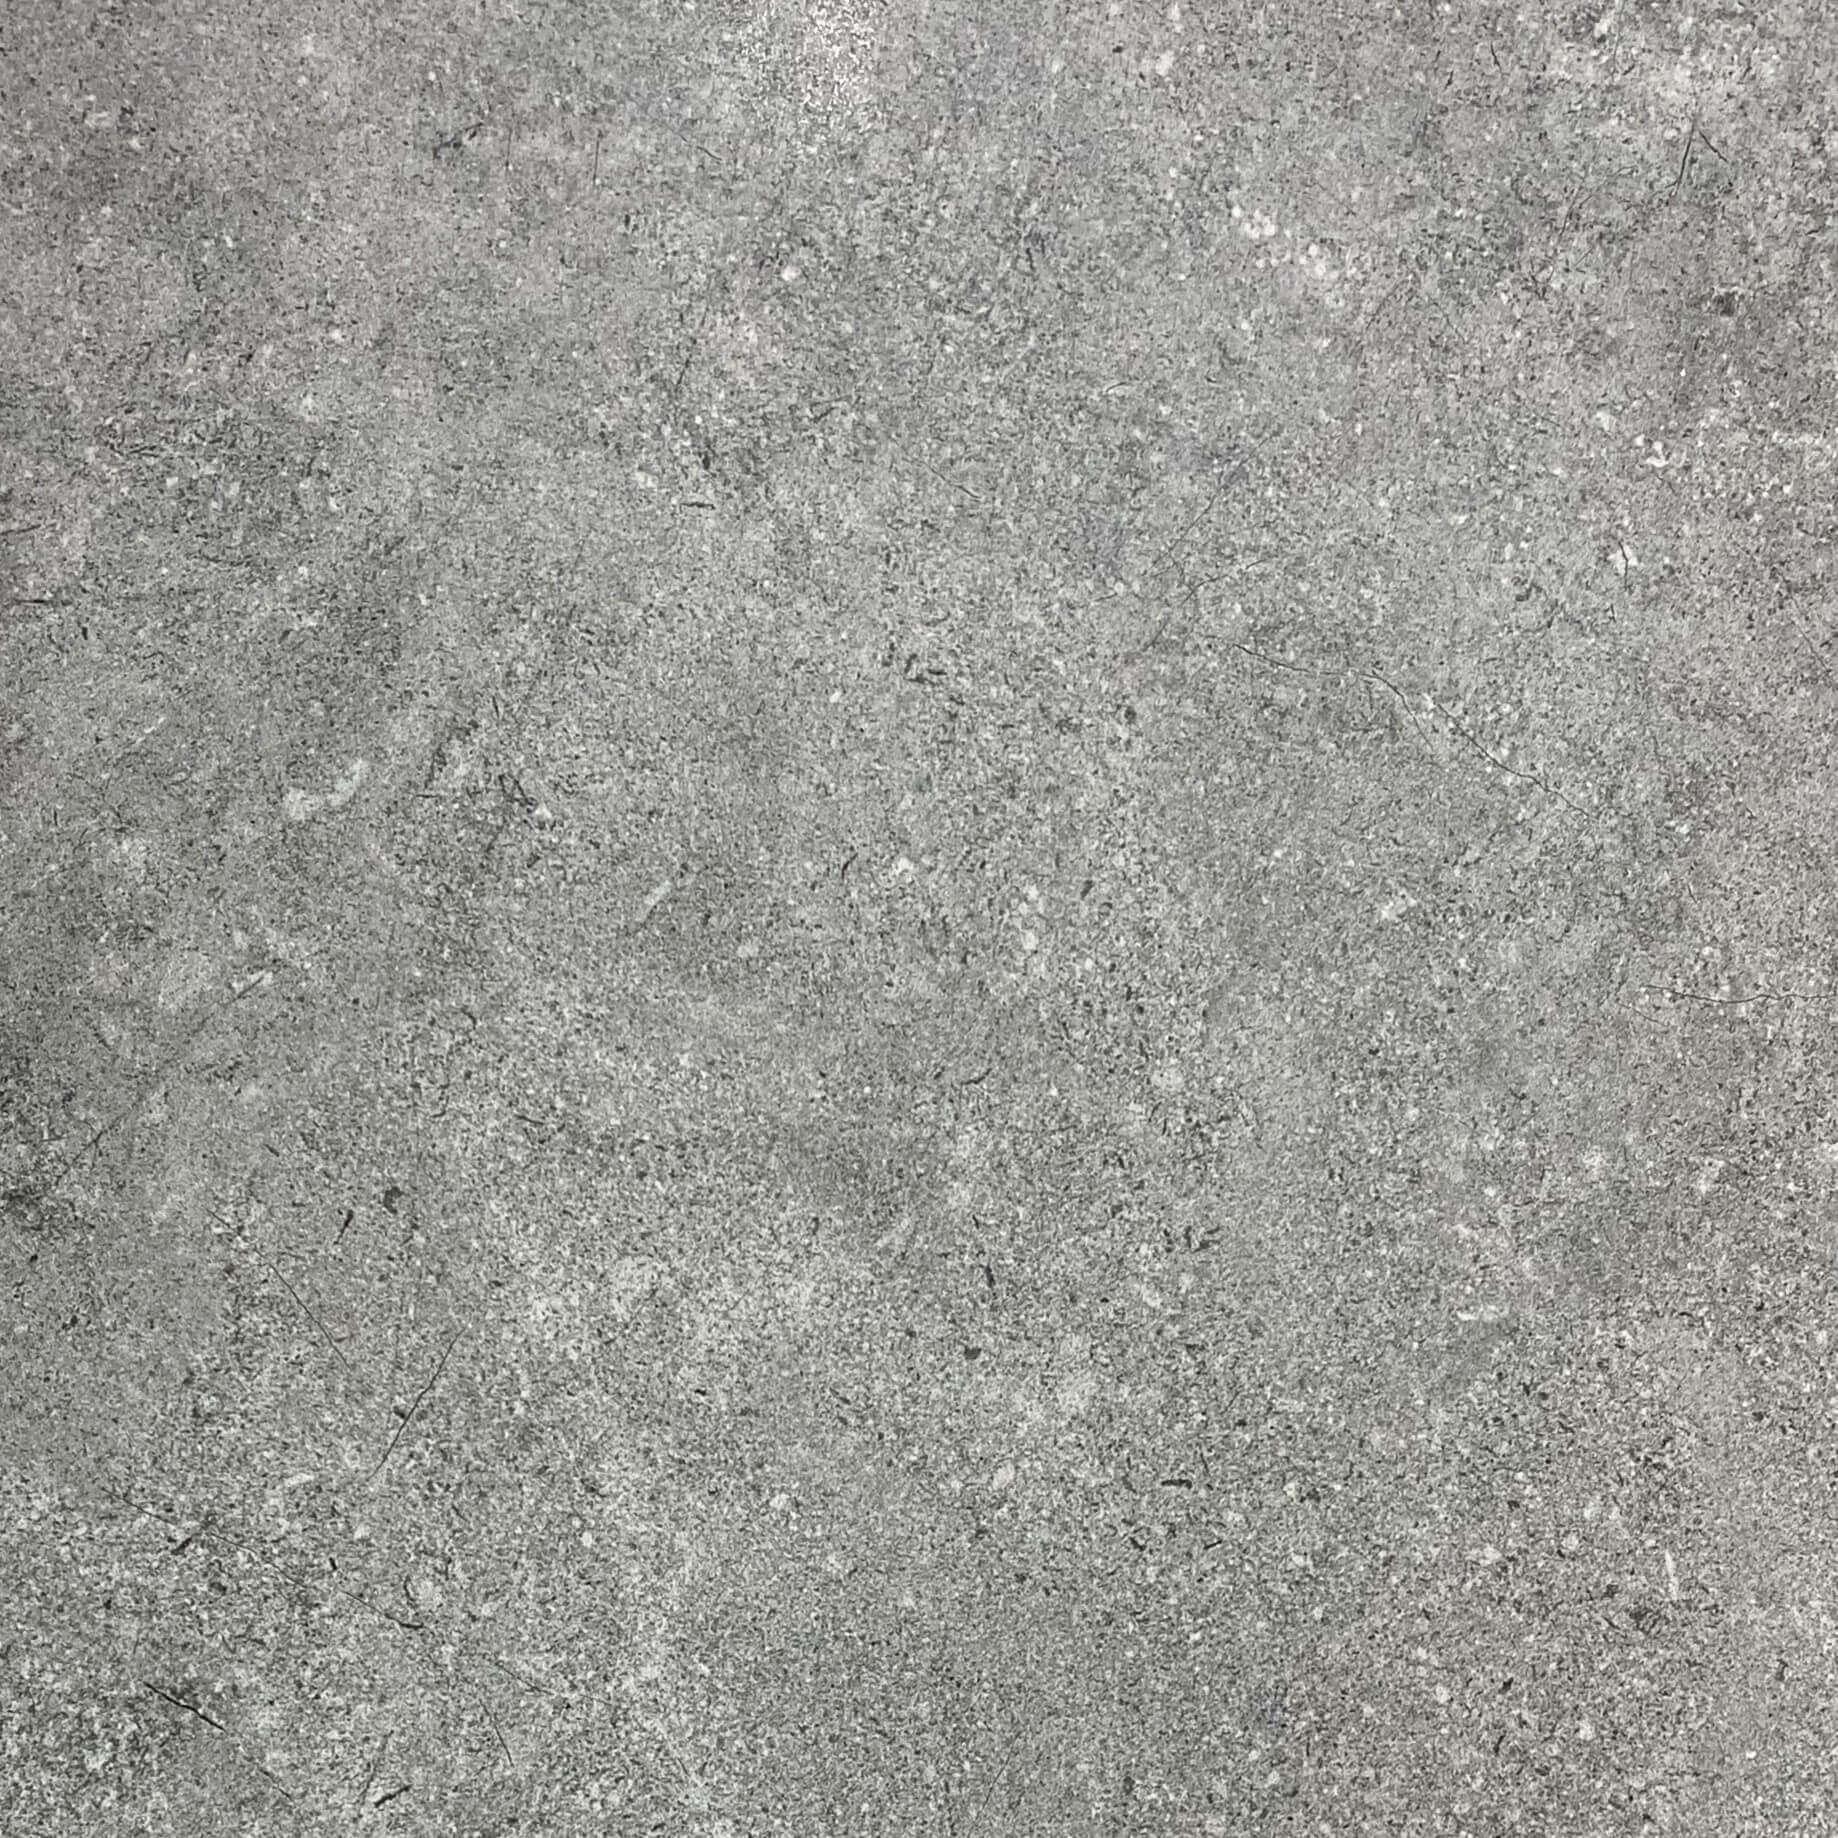 Eco Grey Lappato Rectified Italian Porcelain Tile 3404